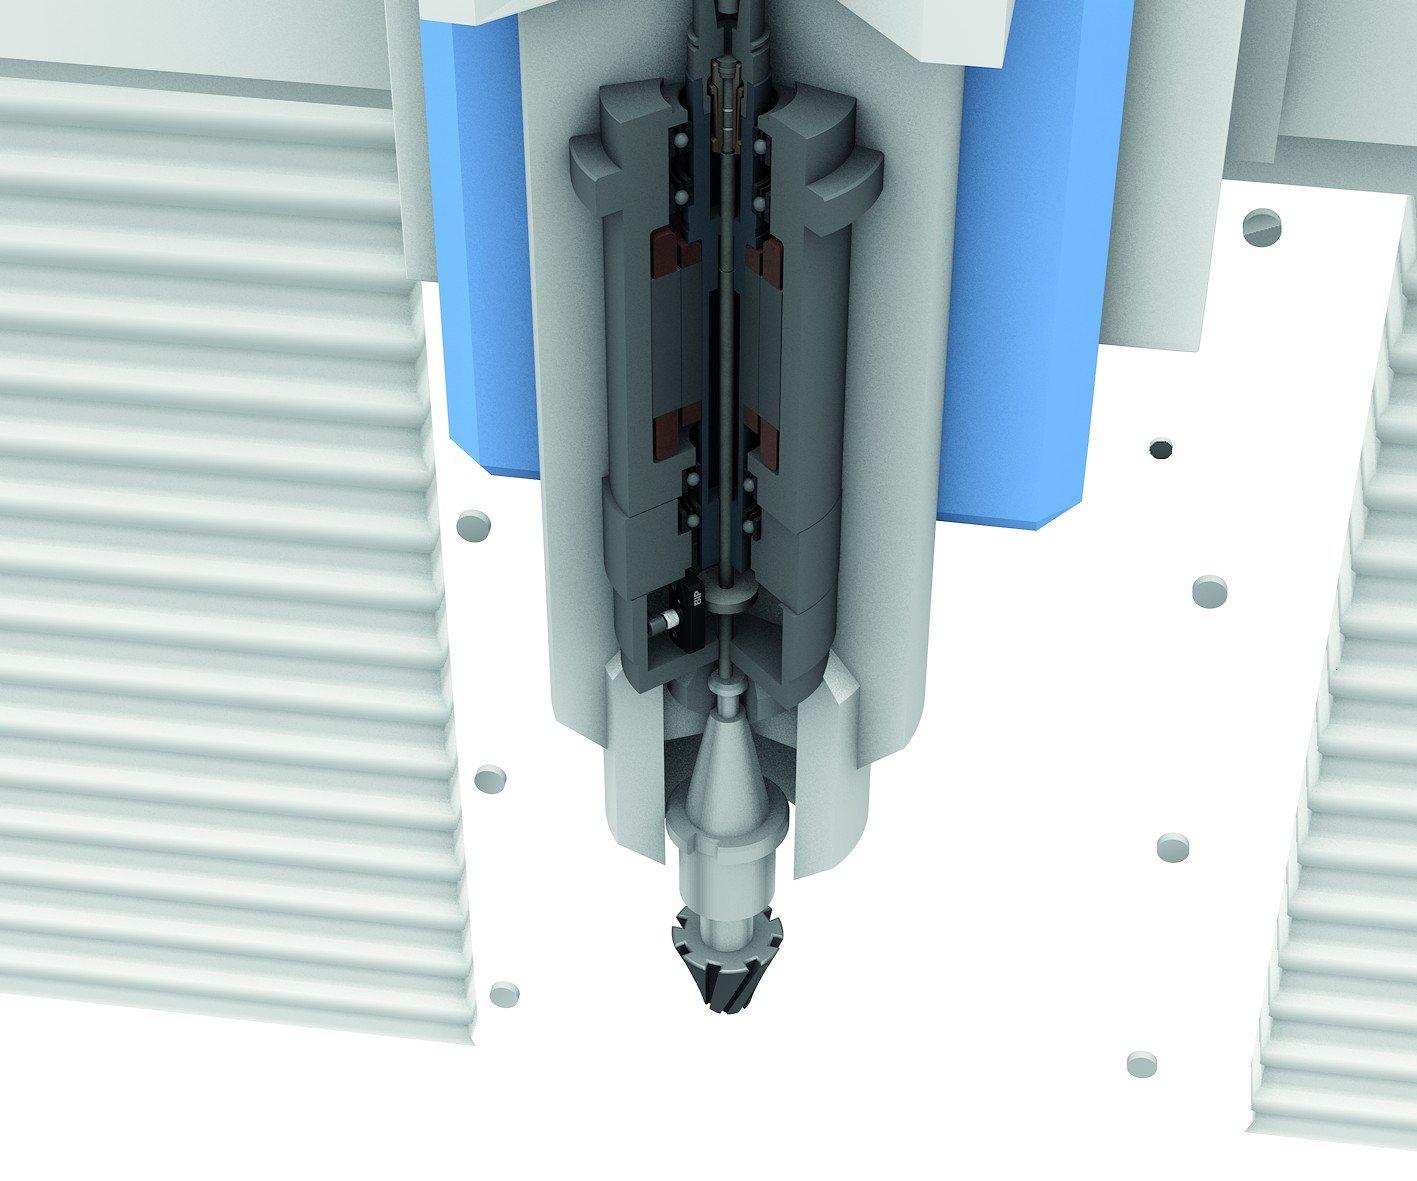 3d metallverarbeitung _frгmaschine_160310 detail 10_0076